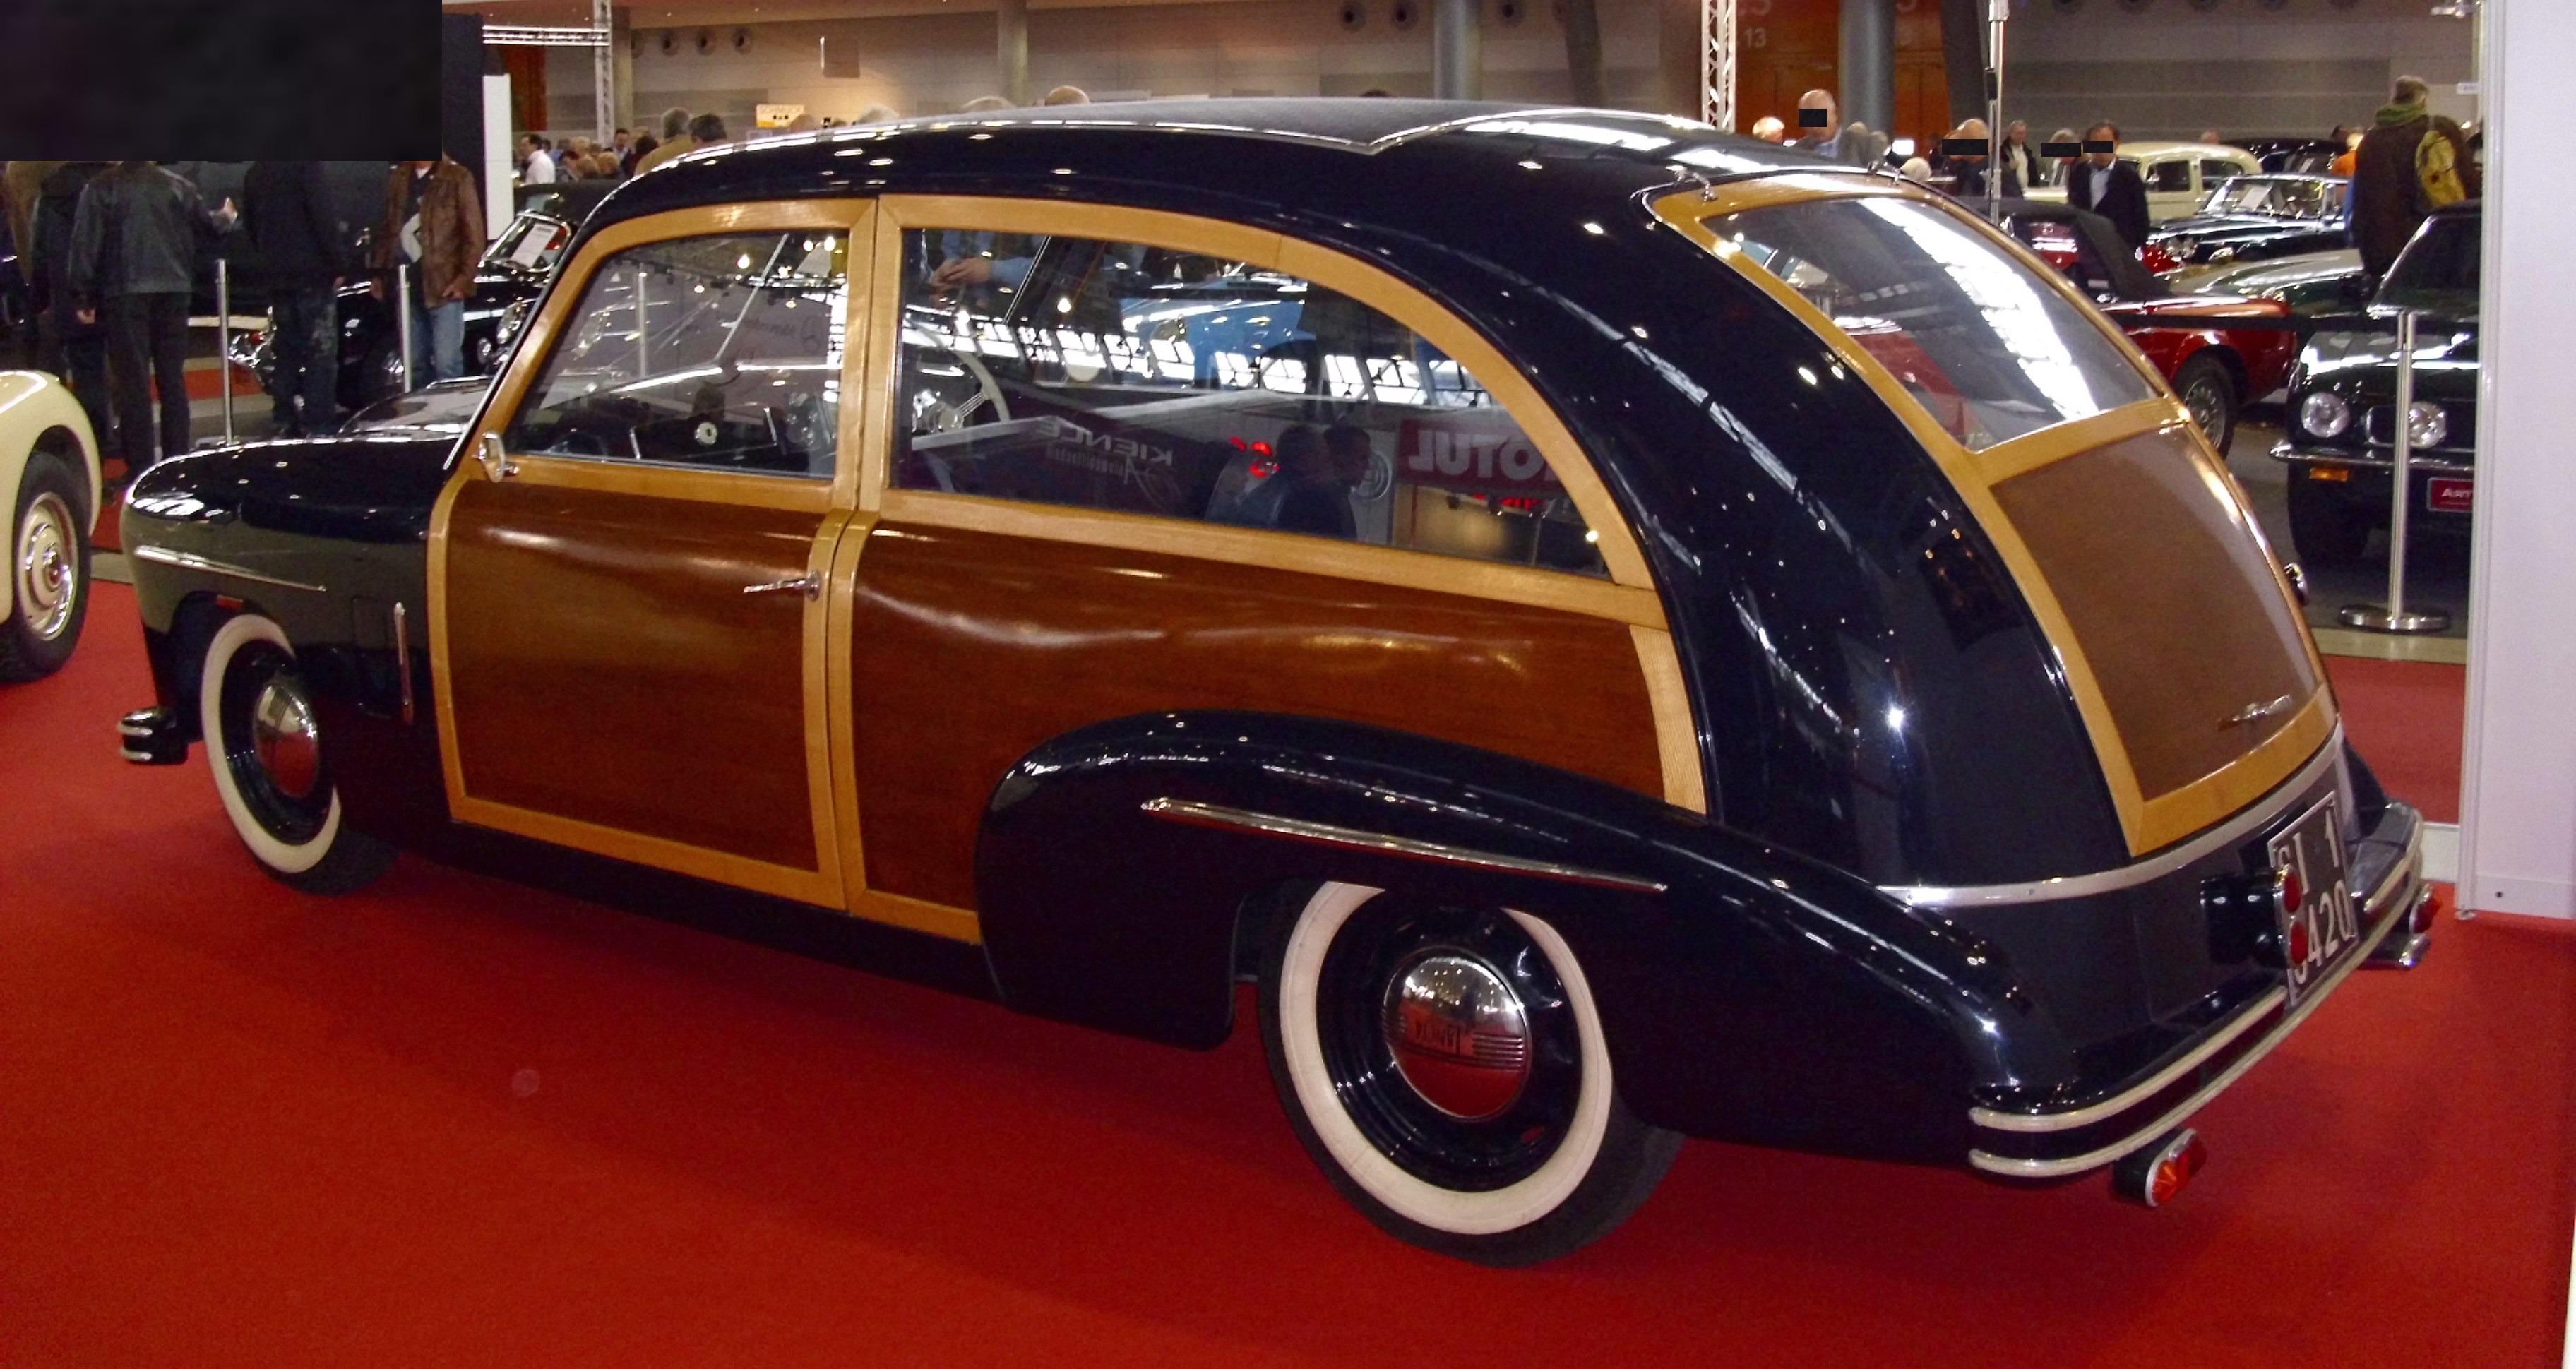 Lancia_Aprilia_Kombi_von_Lombardi_1948_vh